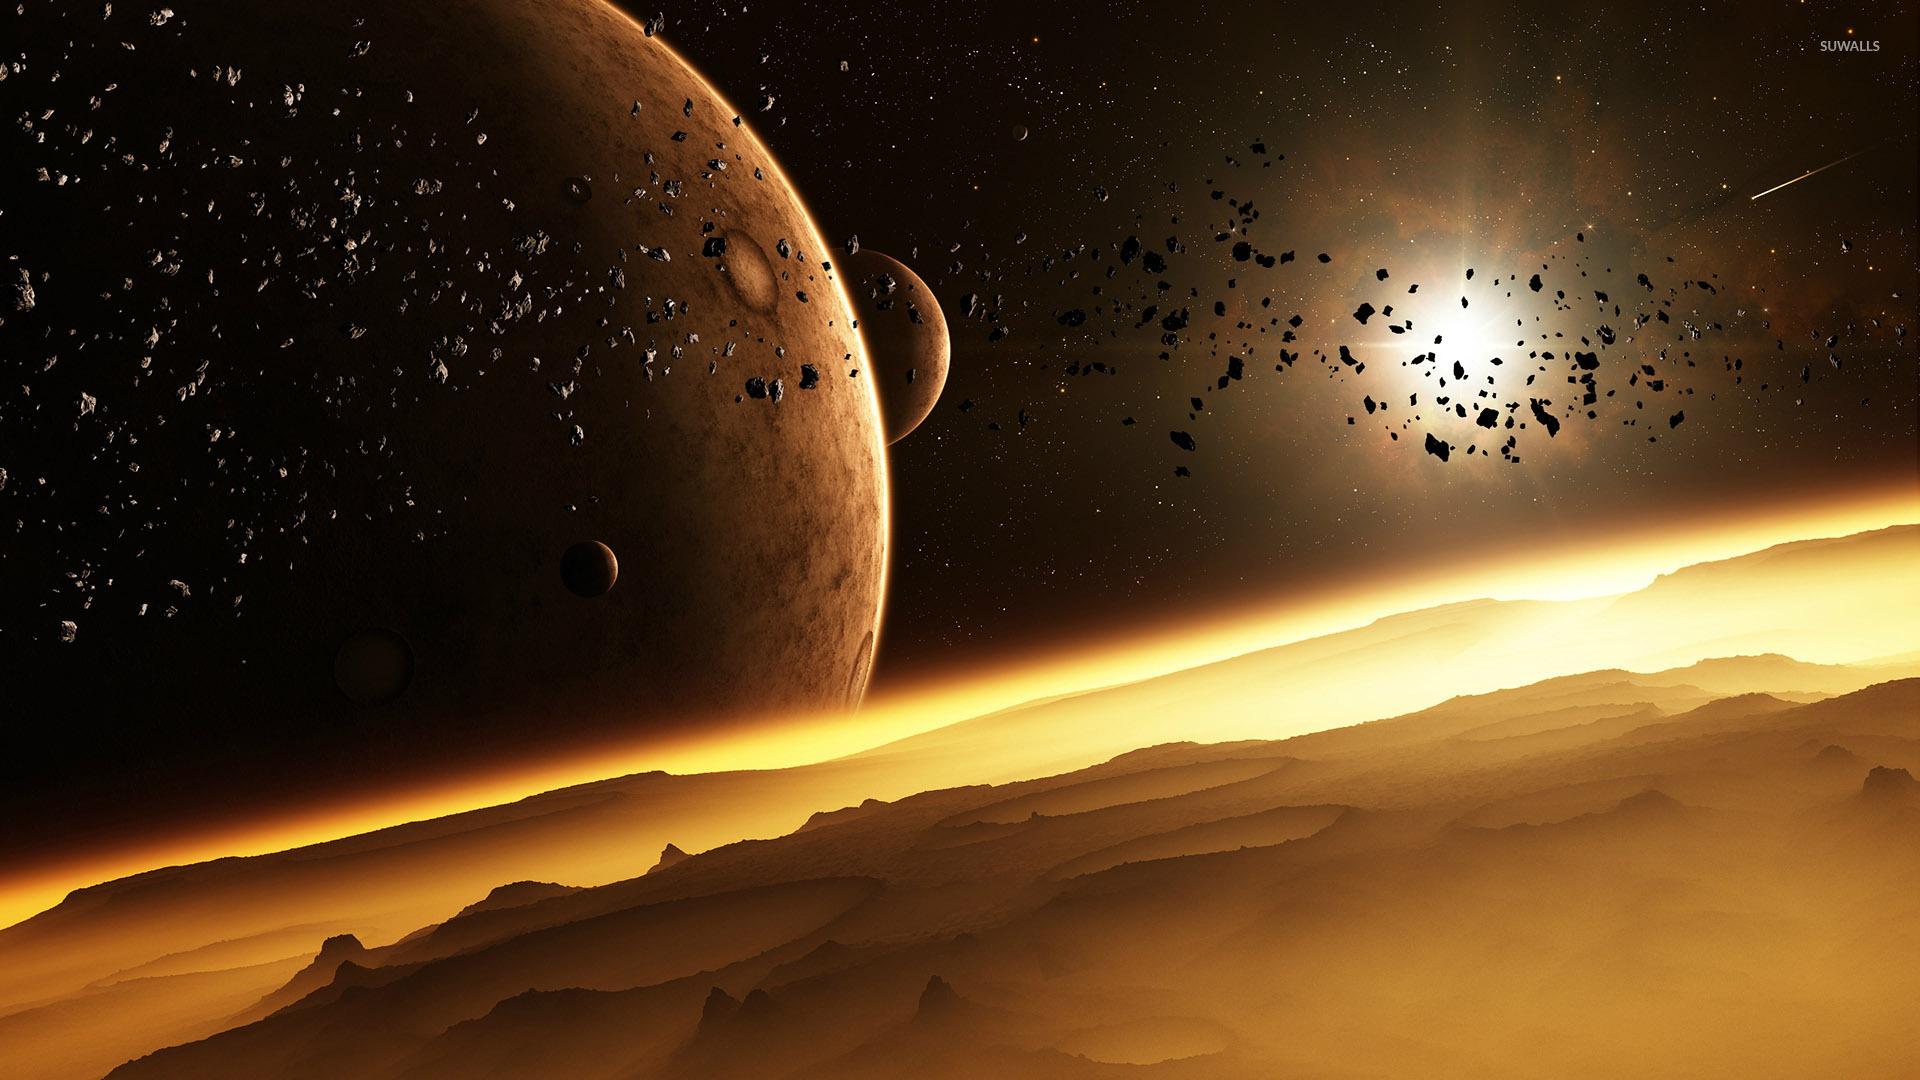 planets-34163-1920x1080.jpg